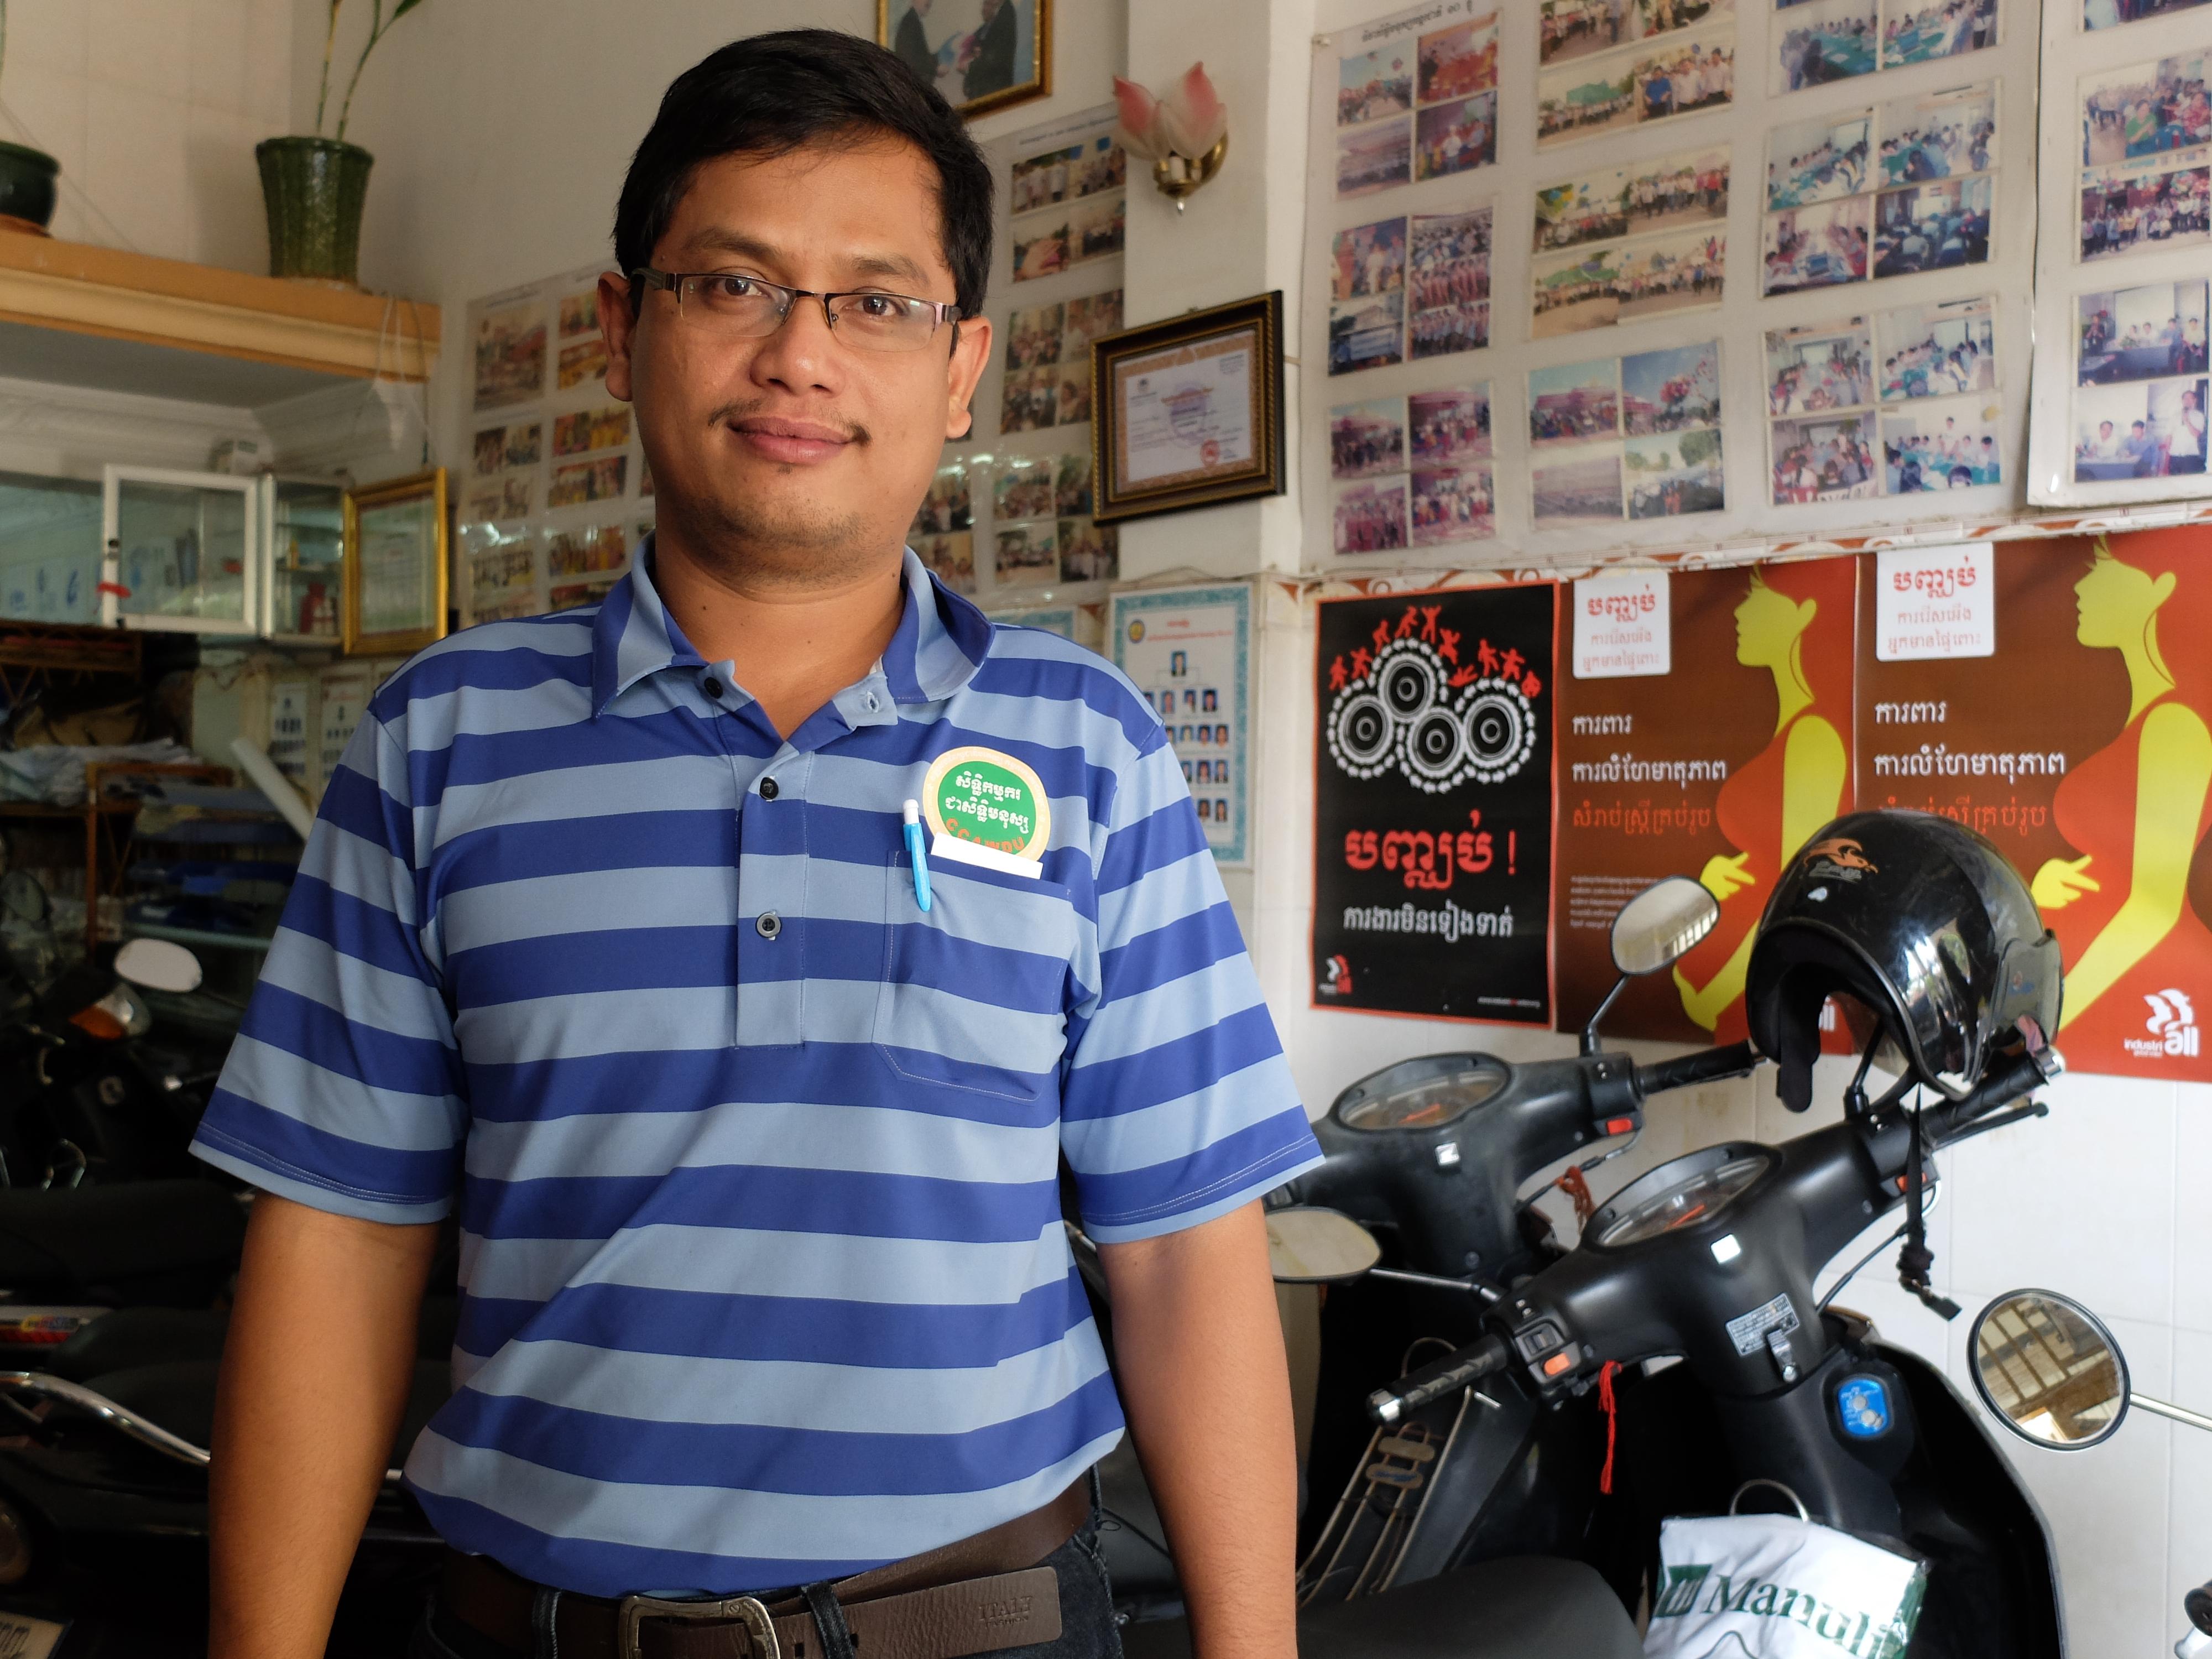 Cambodia – The Unionist